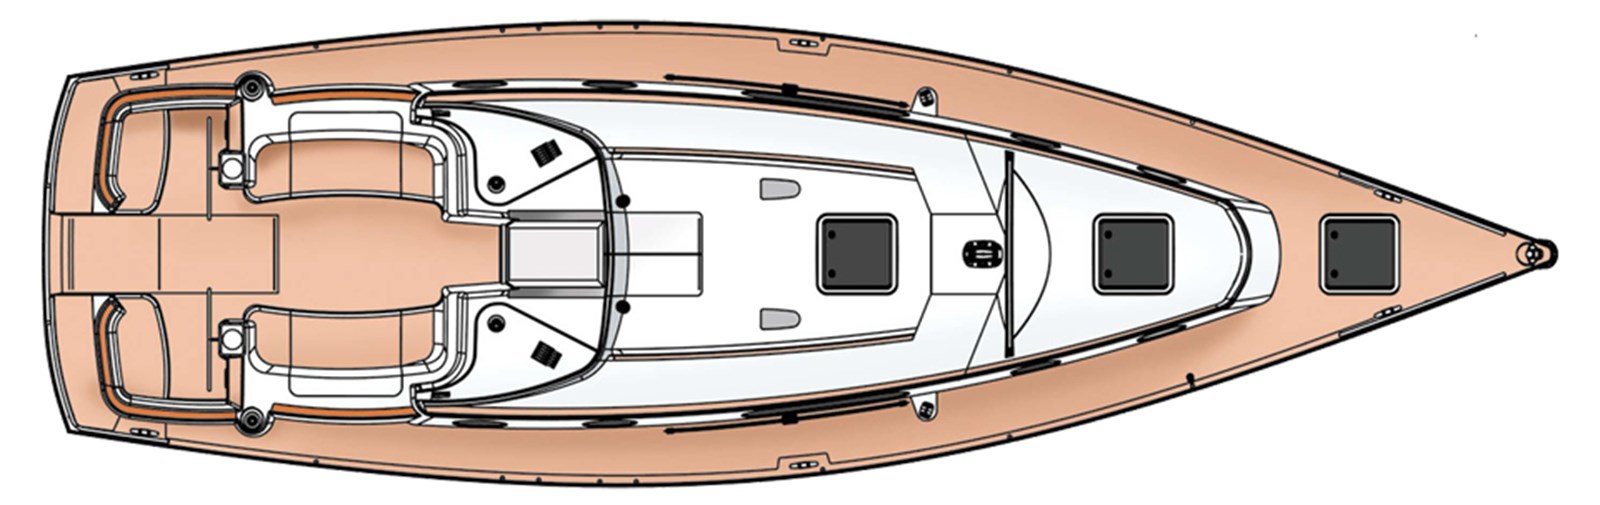 moody-45ac-layout-2 2012 MOODY Moody 45AC Cruising Sailboat 2860663